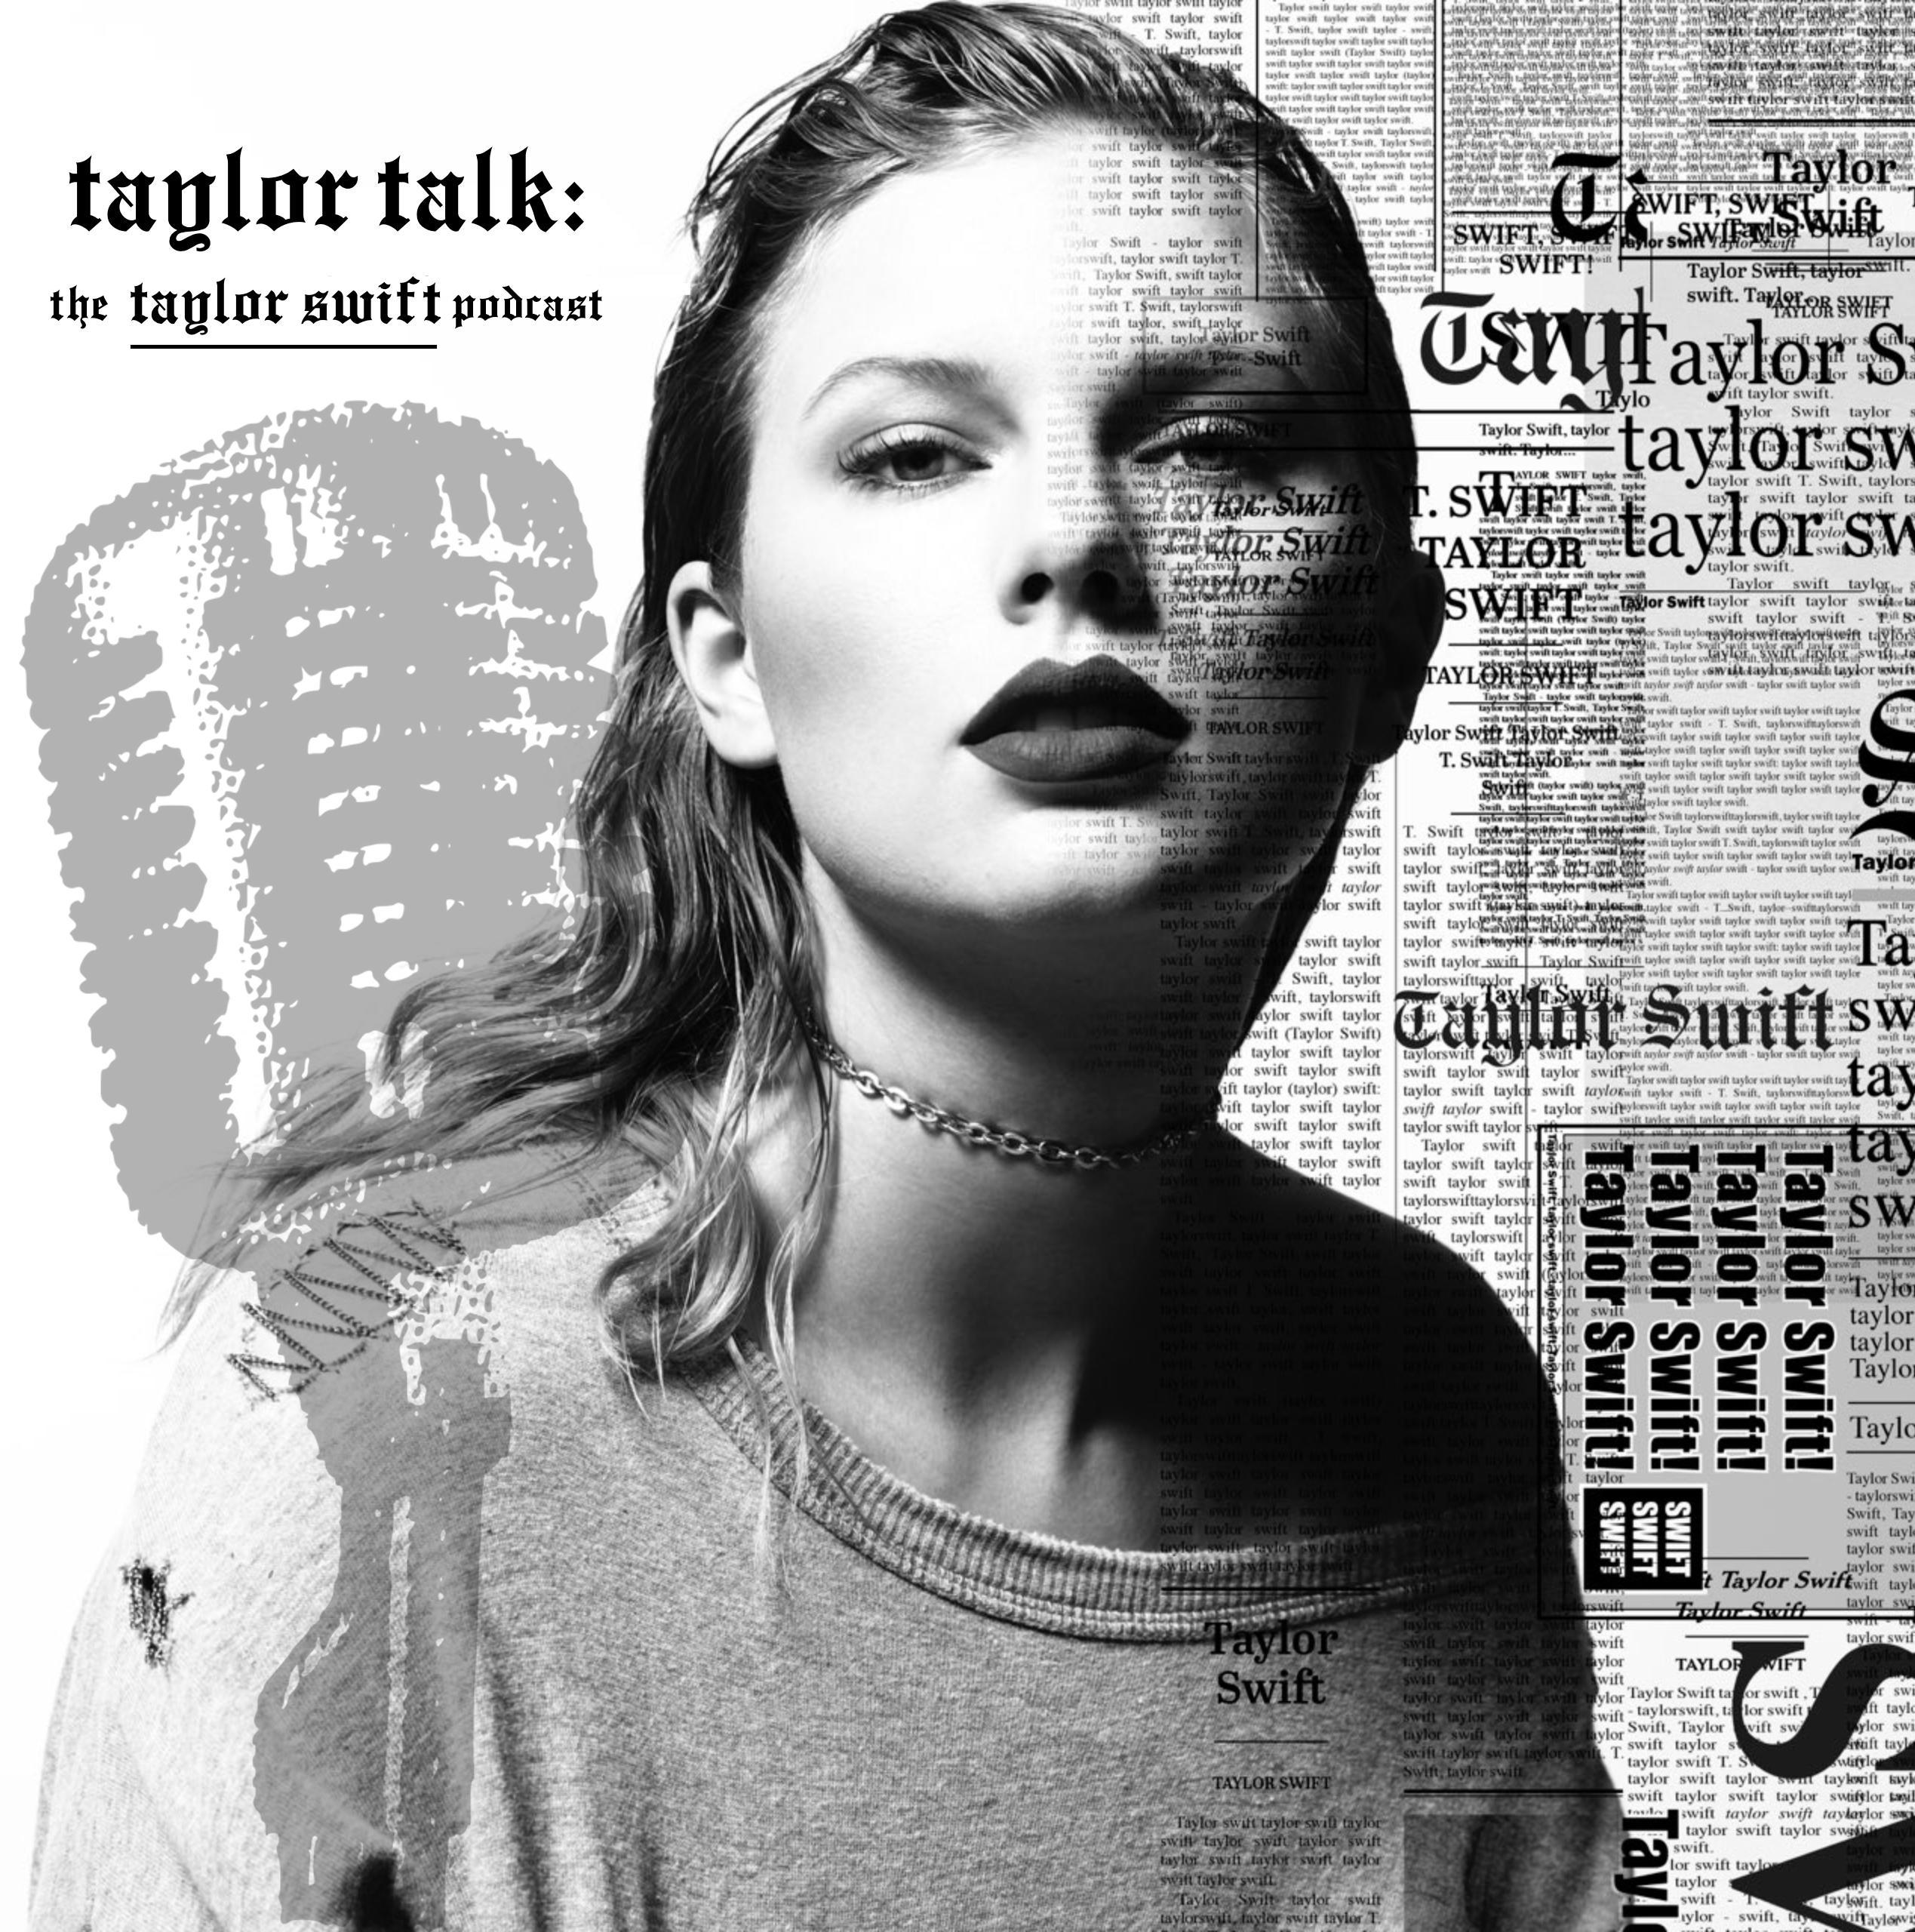 Taylor Talk: The Taylor Swift Podcast | reputation | 1989